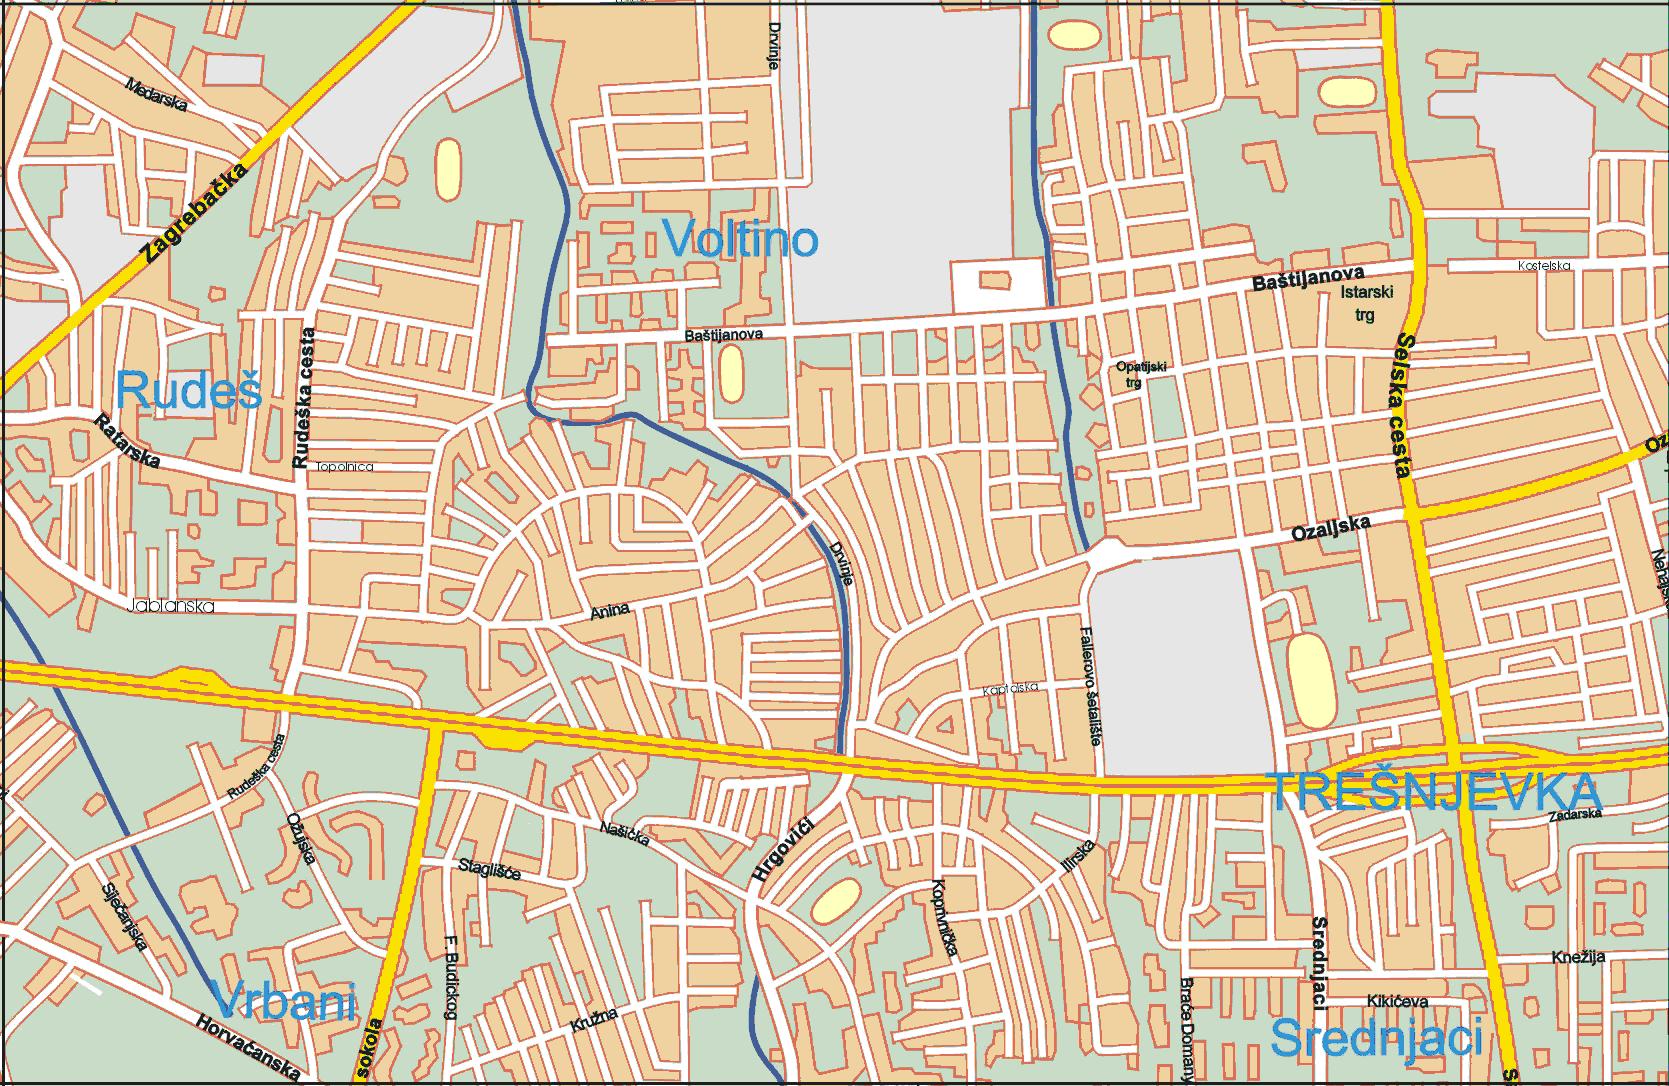 Glazbena karta grada zagreba ivan zajc altavistaventures Image collections